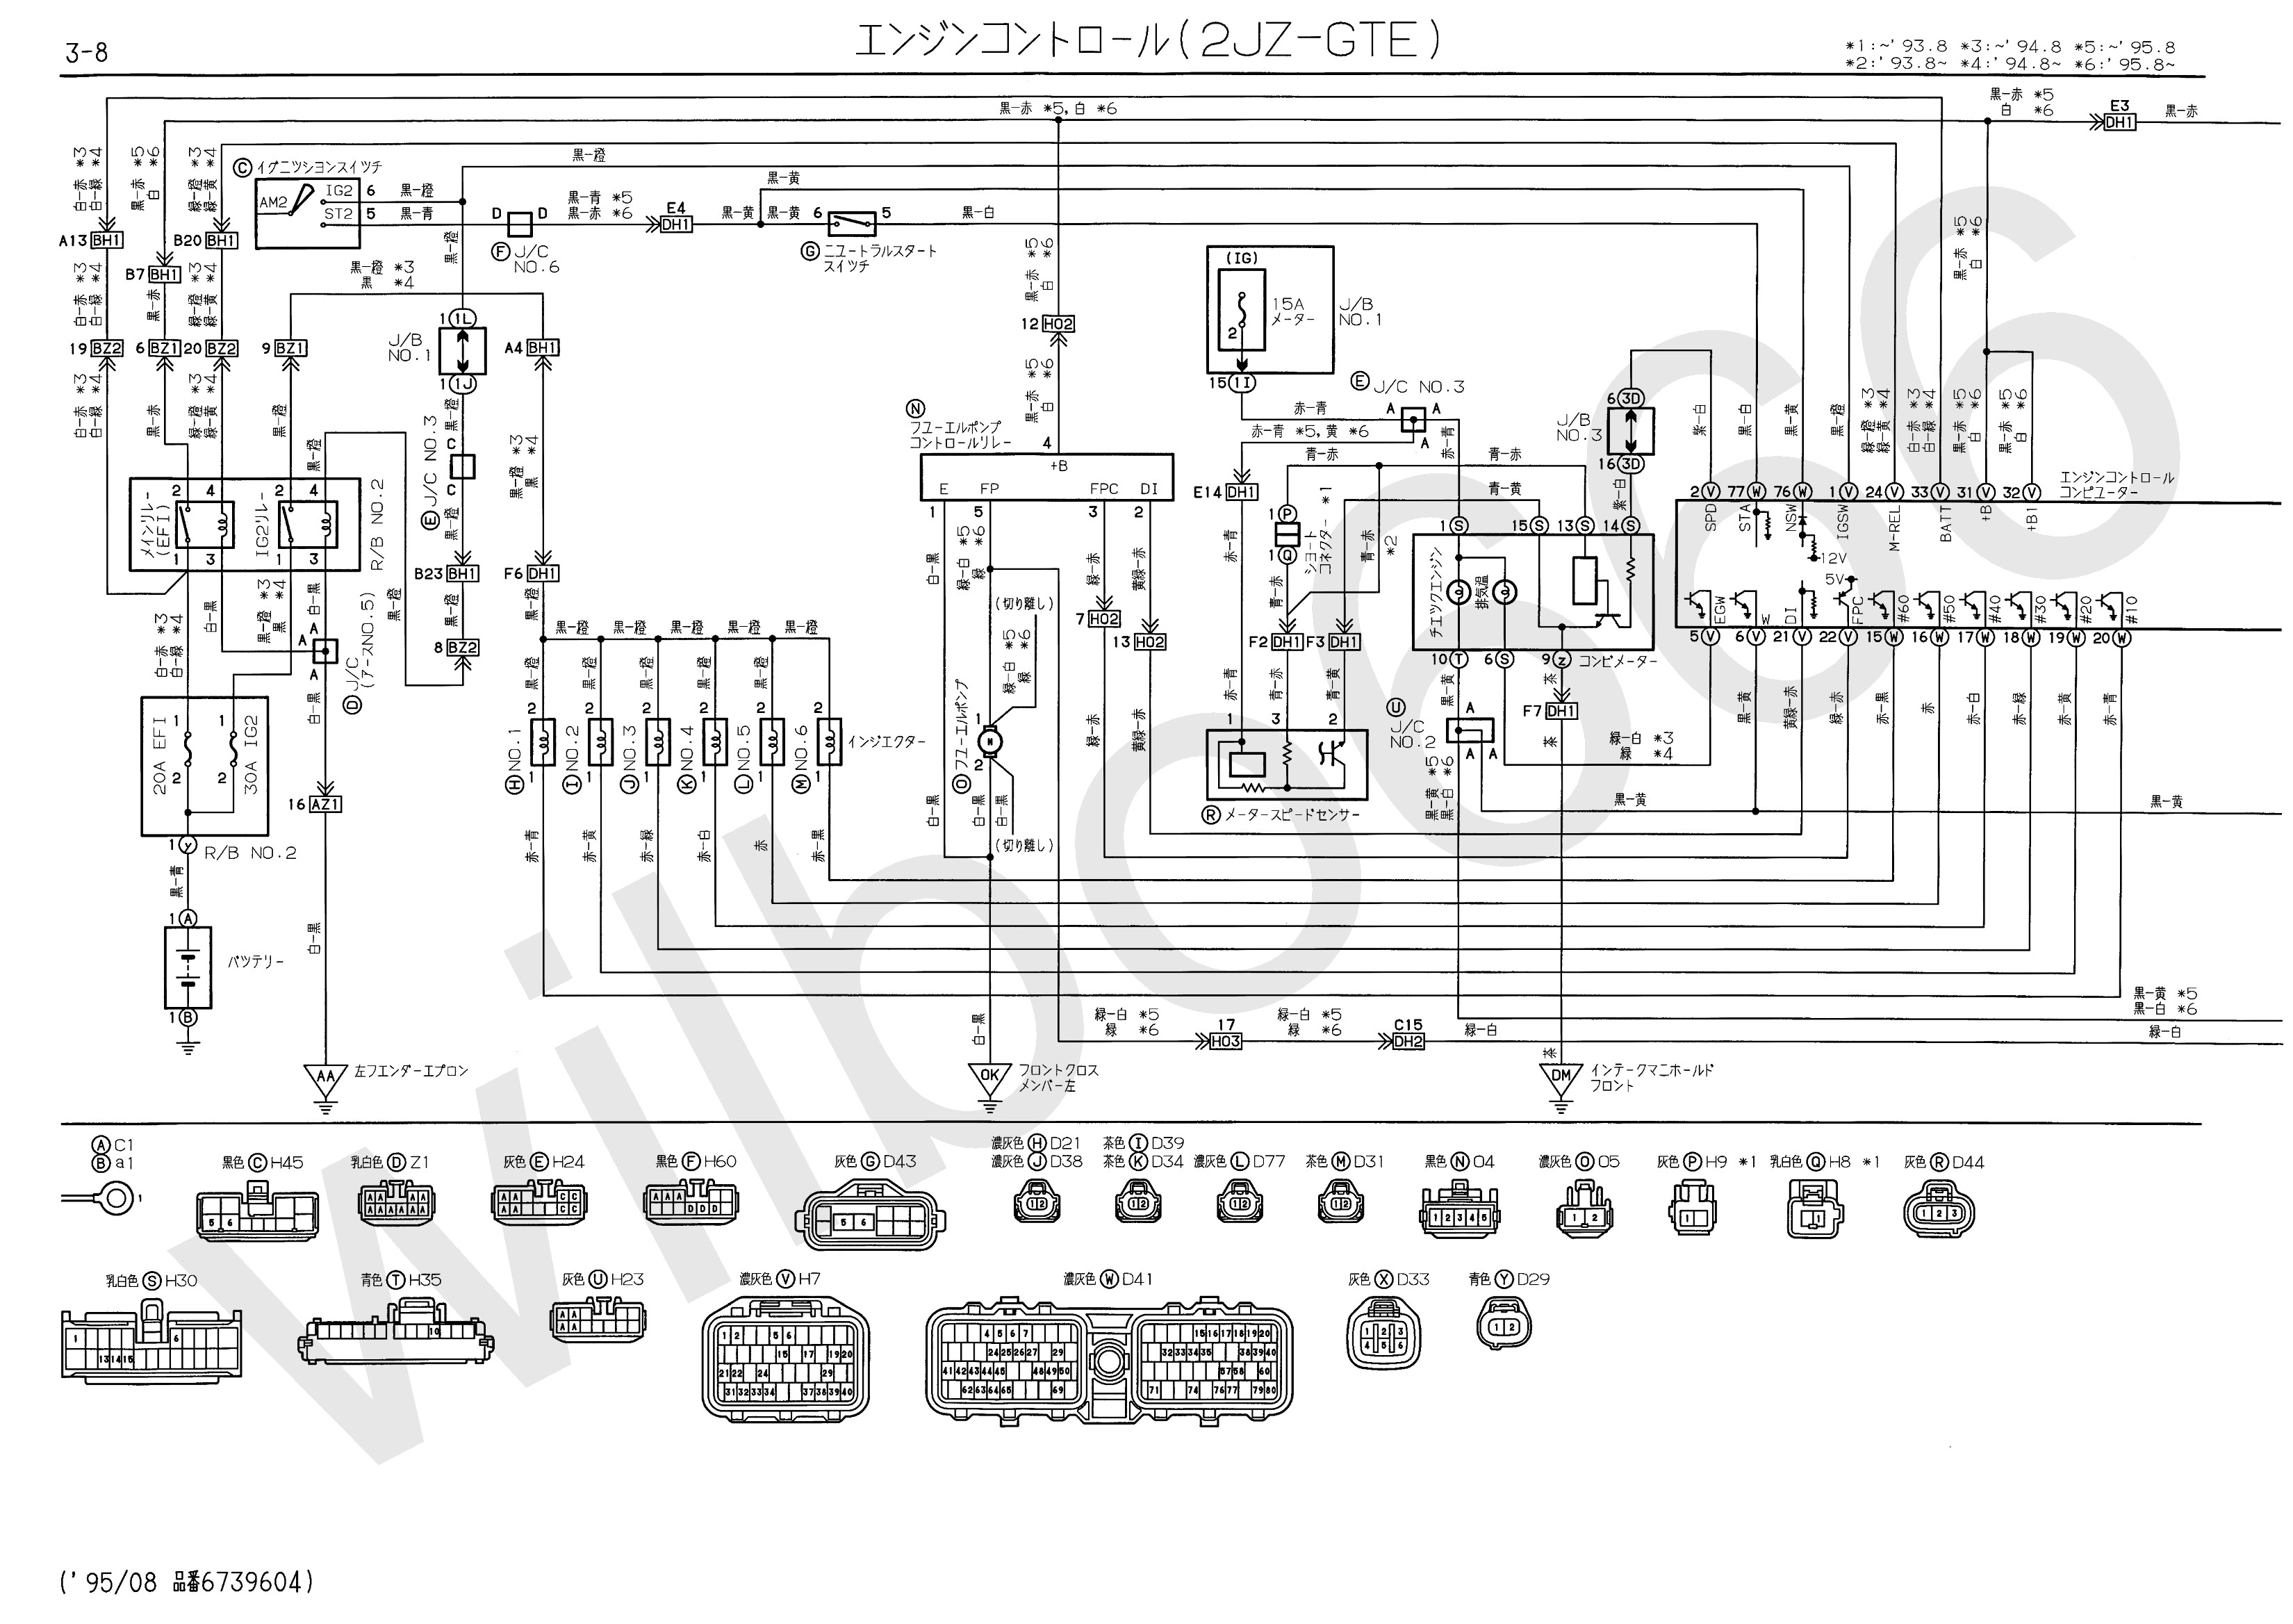 Fuel Injection System Diagram Wilbo666 2jz Gte Jzs147 Aristo Engine Wiring Of Fuel Injection System Diagram